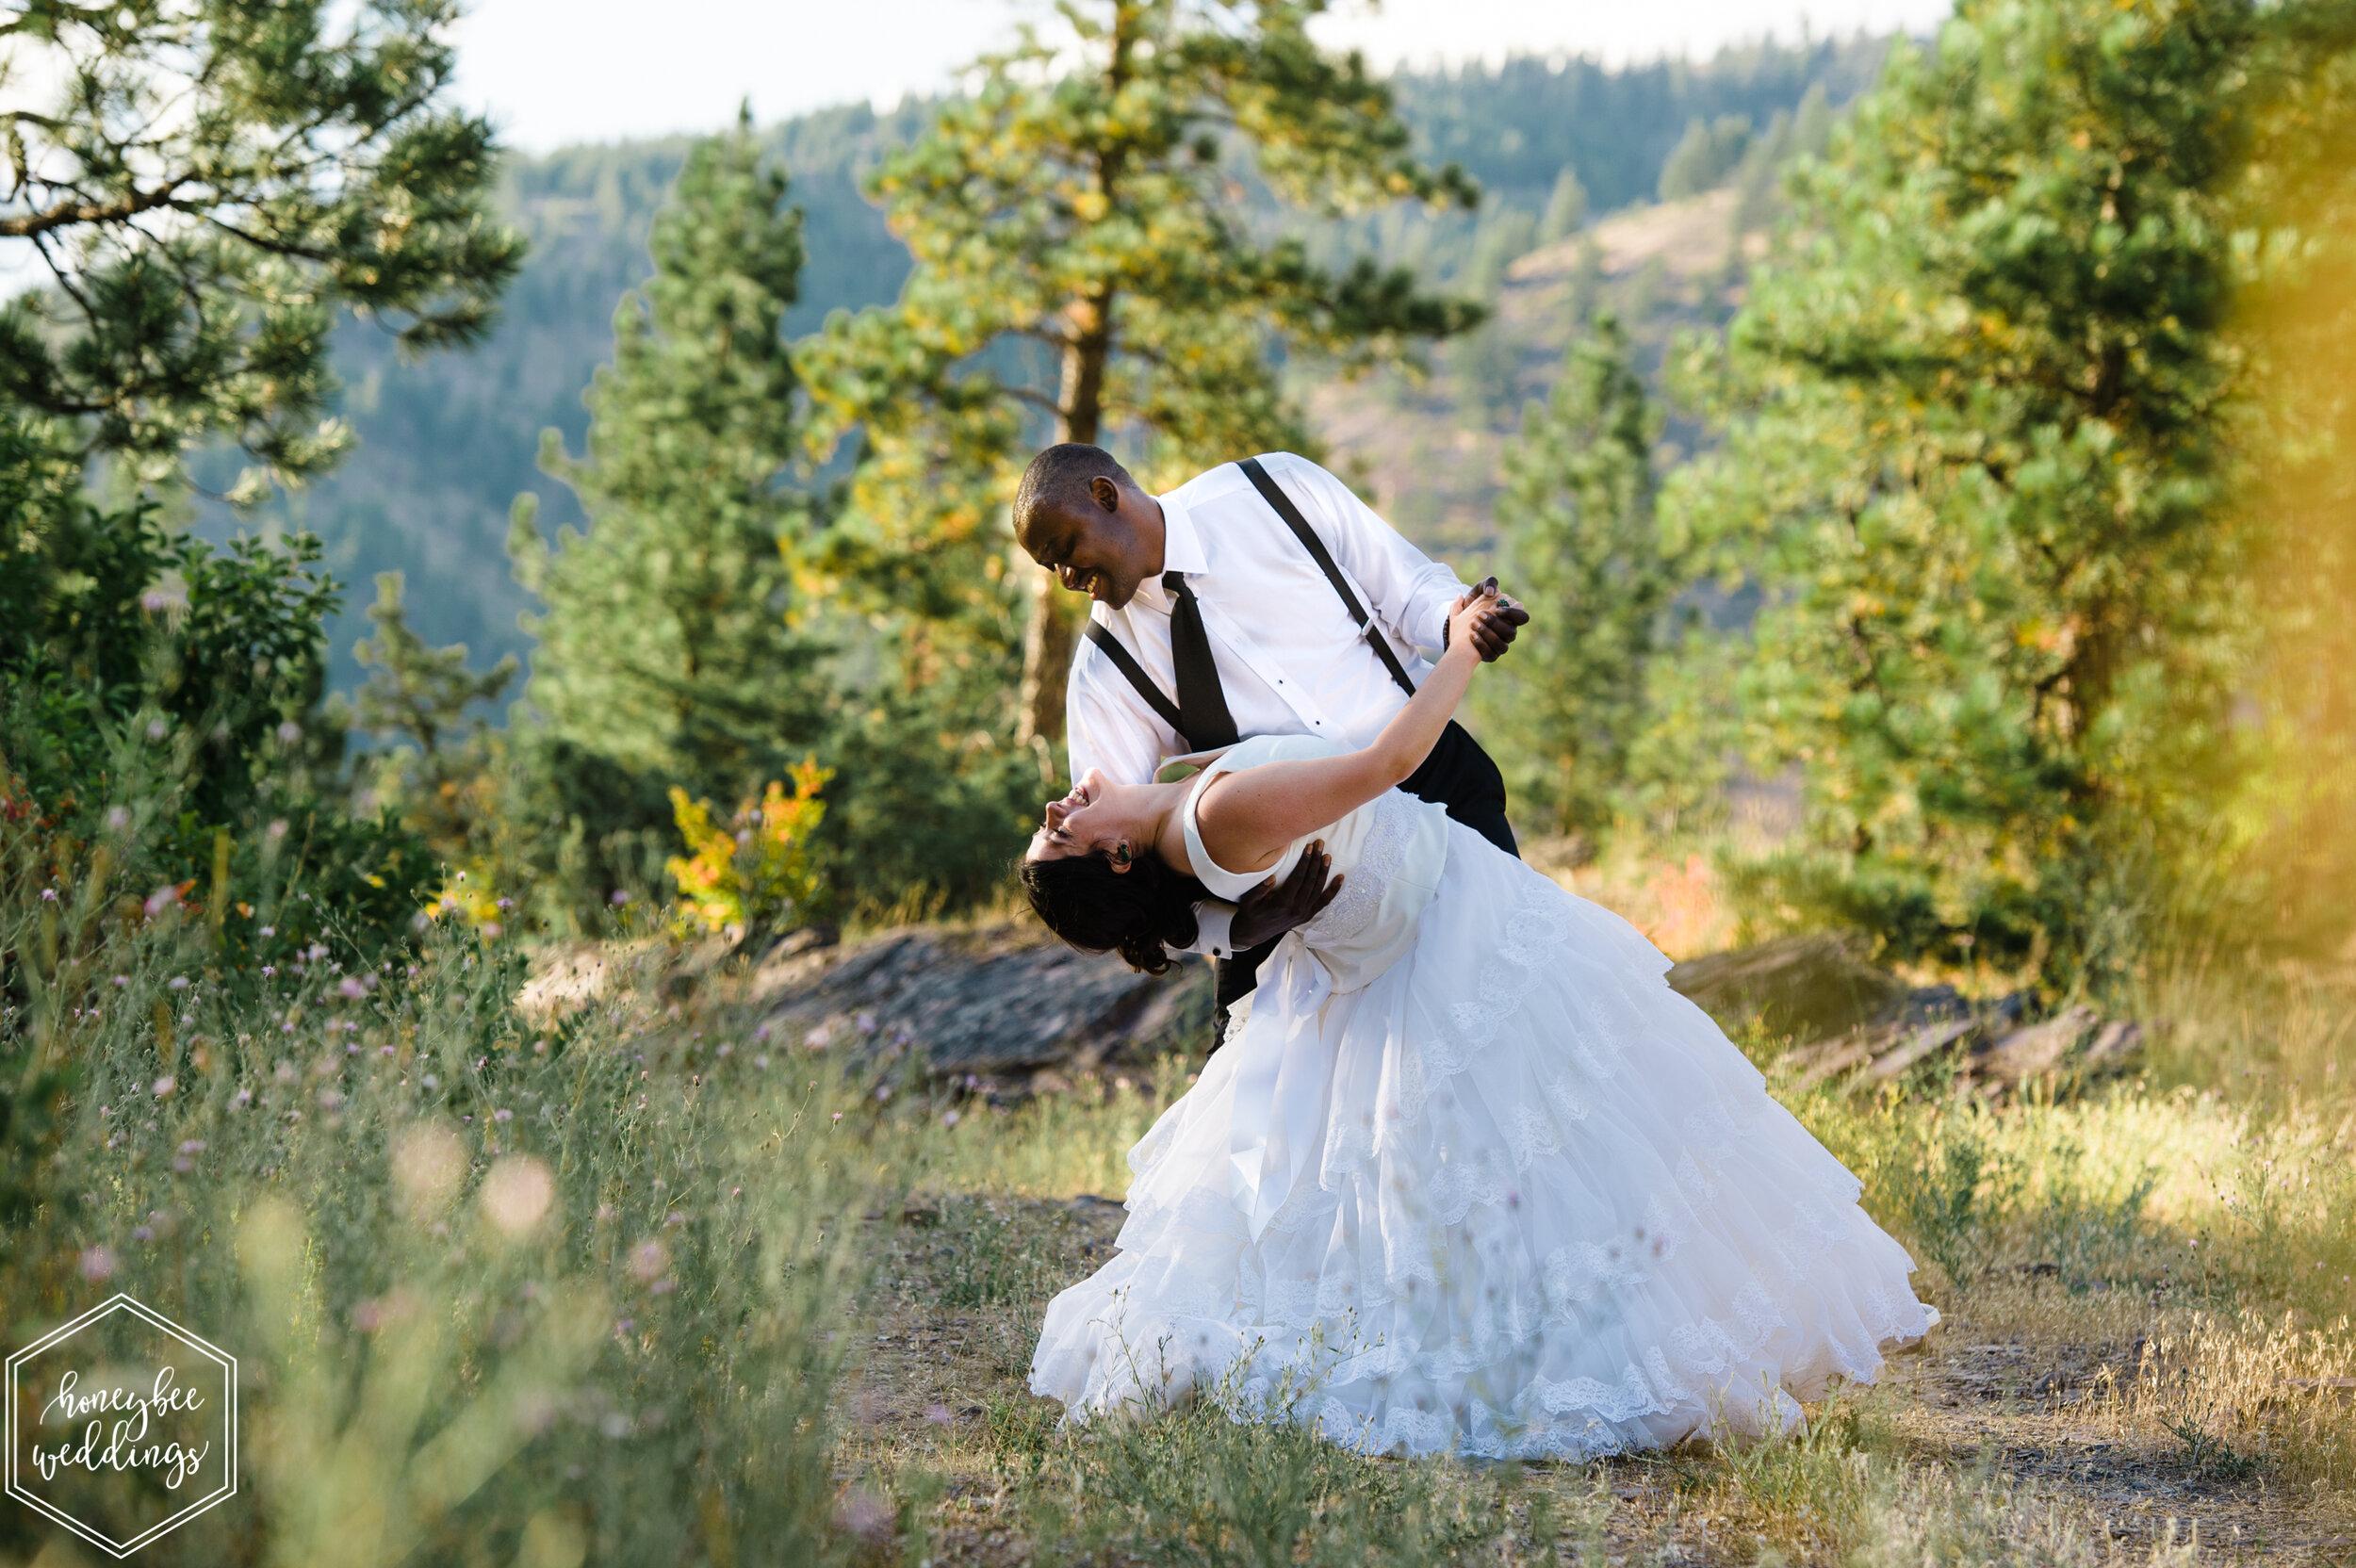 015White Raven Wedding_Montana Wedding Photographer_Rebekah & Likom_July 27, 2019.jpg